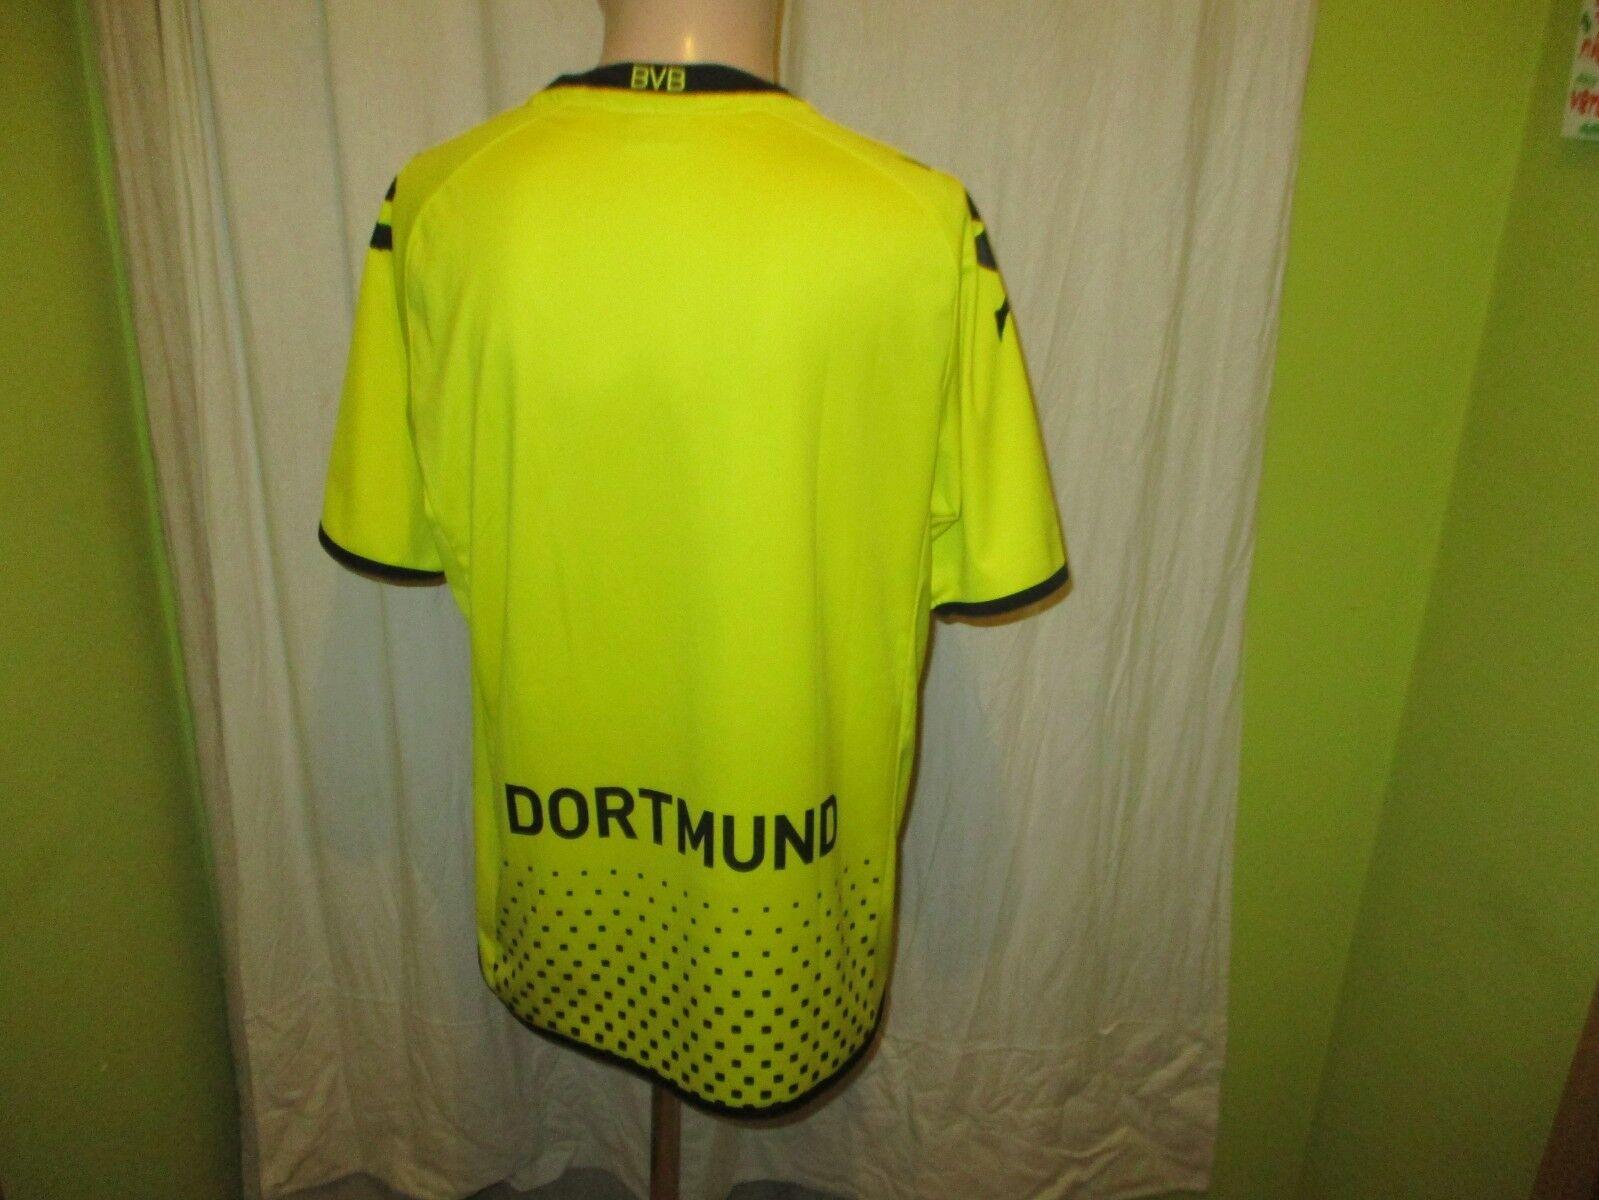 Borussia Dortmund Kappa Deutscher Meister Meister Meister Trikot 2011 12  EVONIK  Gr.L TOP 59b137